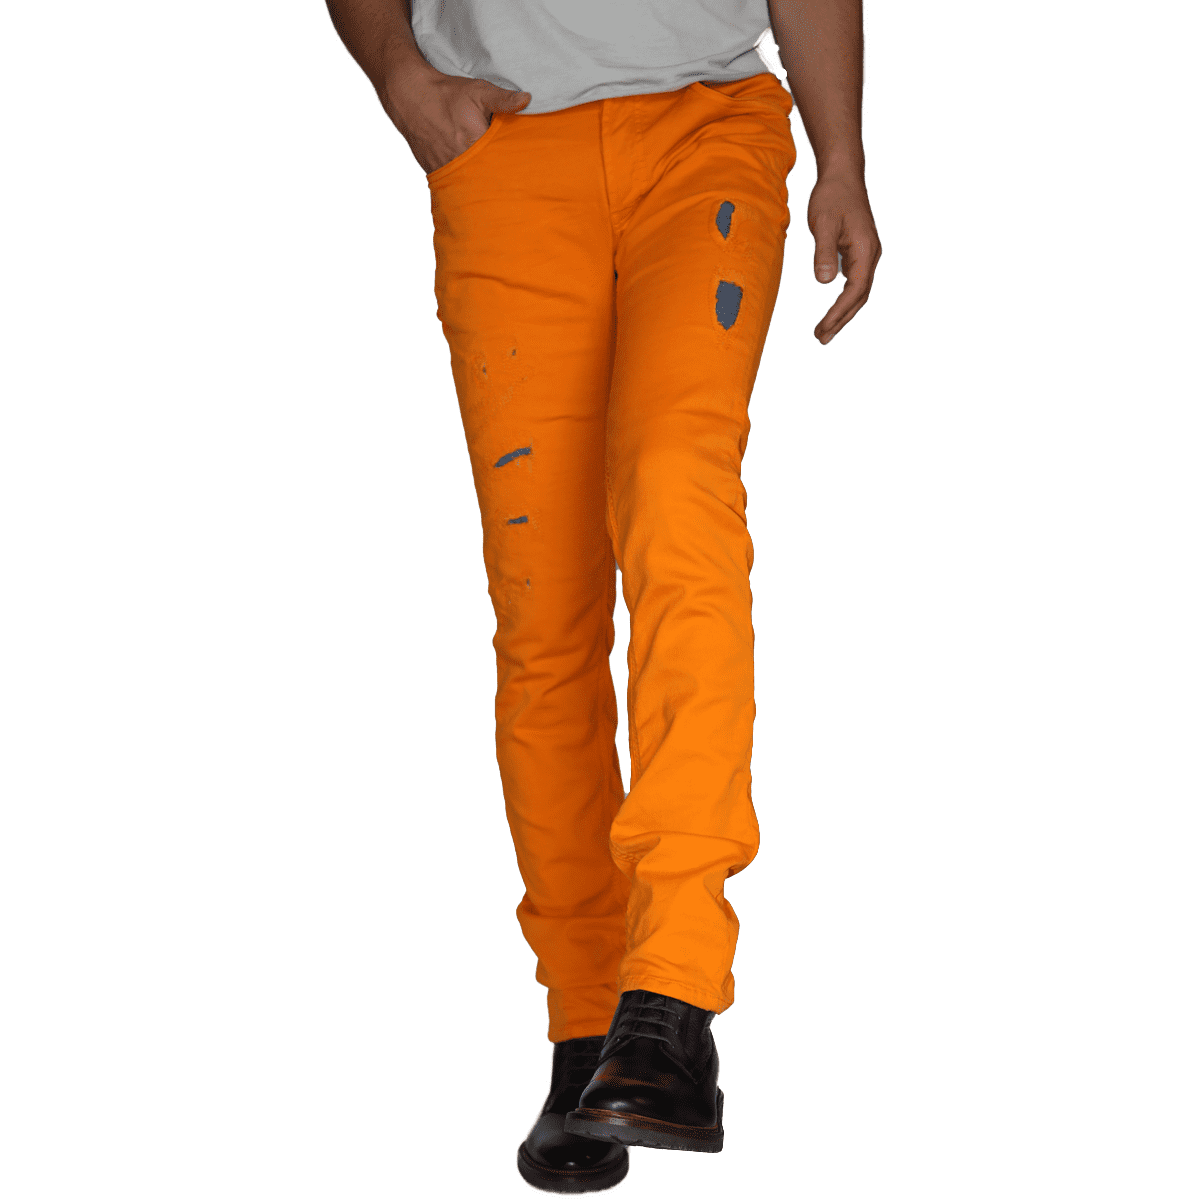 Cabinero Stiles Berlin PG Enjoy Jeans, Herrenhosen, made in Italy AW17-18 denim curry blue 1